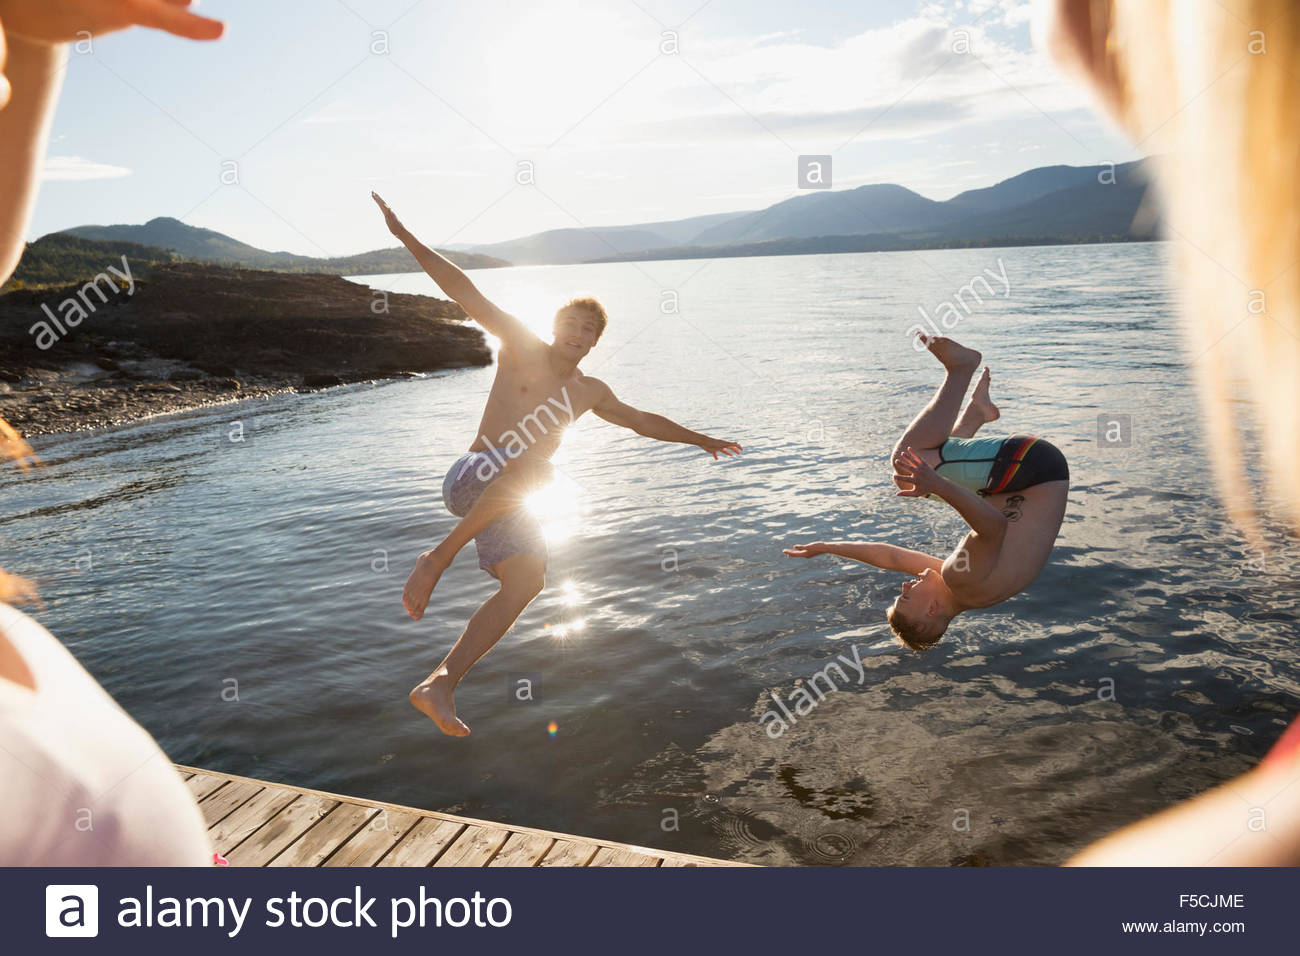 Junge Frauen, die gerade Männer in See springen Stockbild